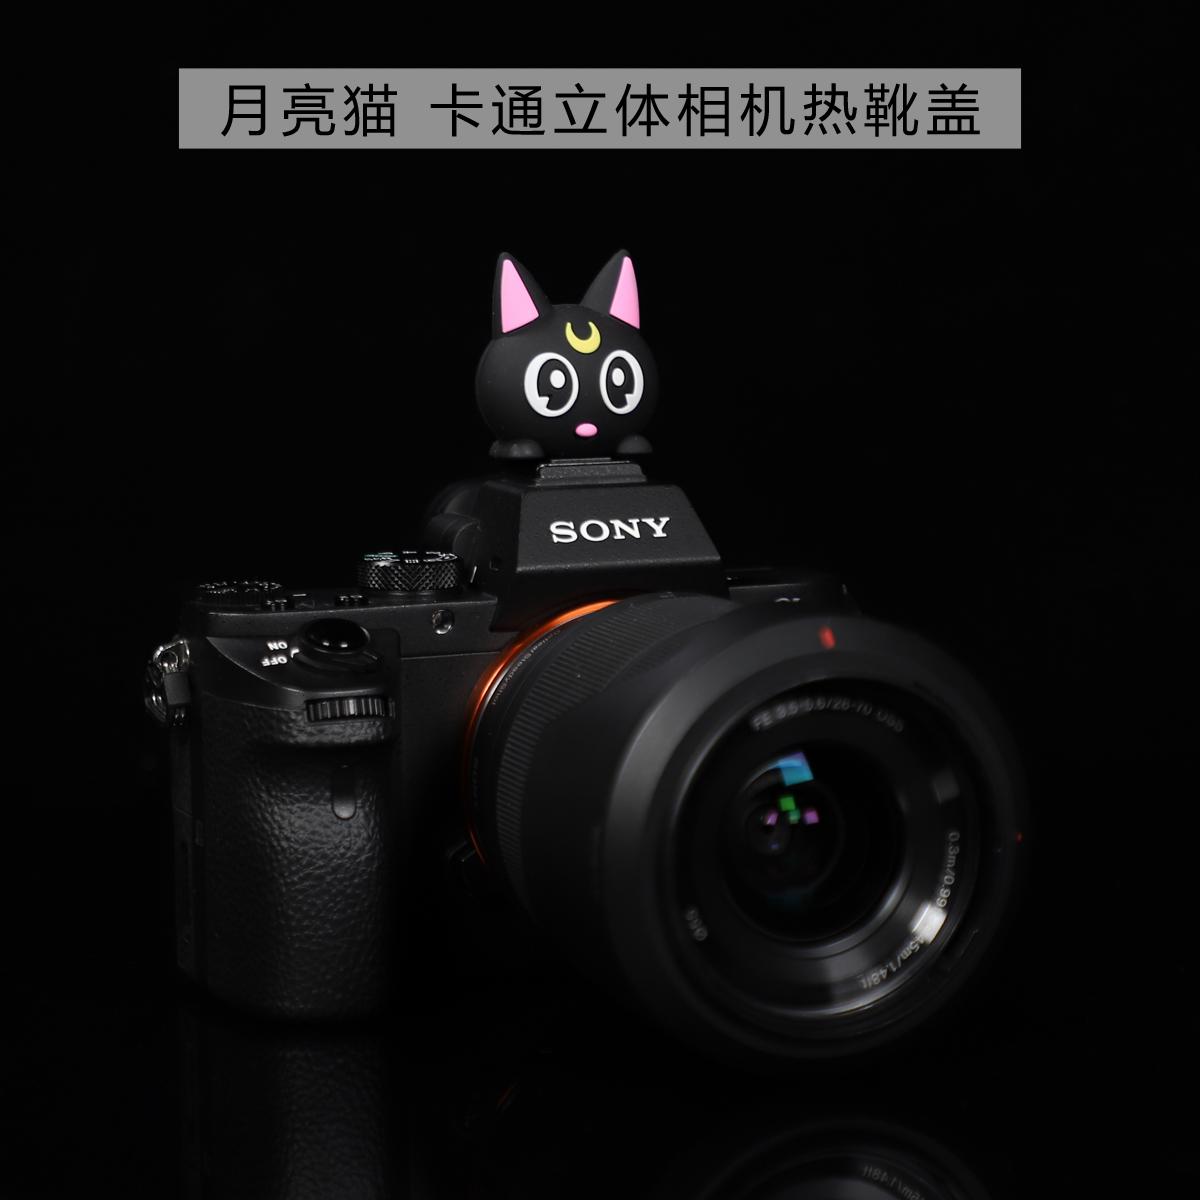 Фотокамеры Артикул 584582115662